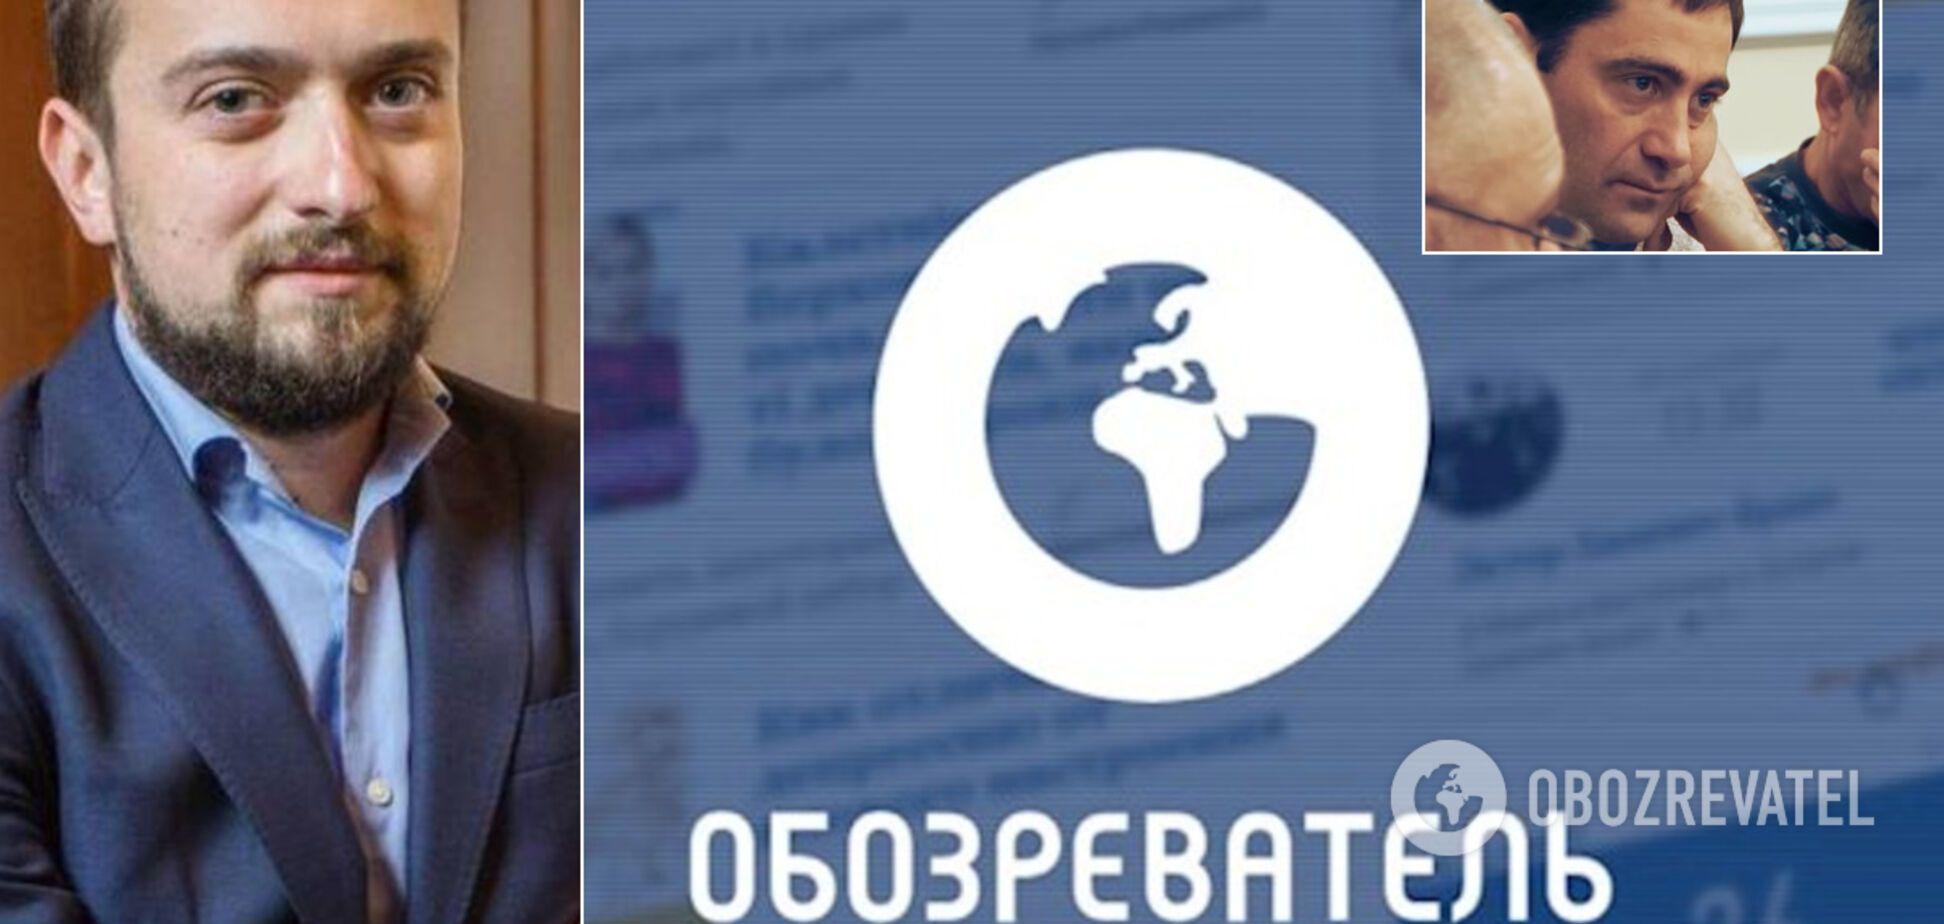 Кибератака на OBOZREVATEL. Господин Зеленский! Баум и Тимошенко пустили коронавирусные деньги на борьбу со свободой слова